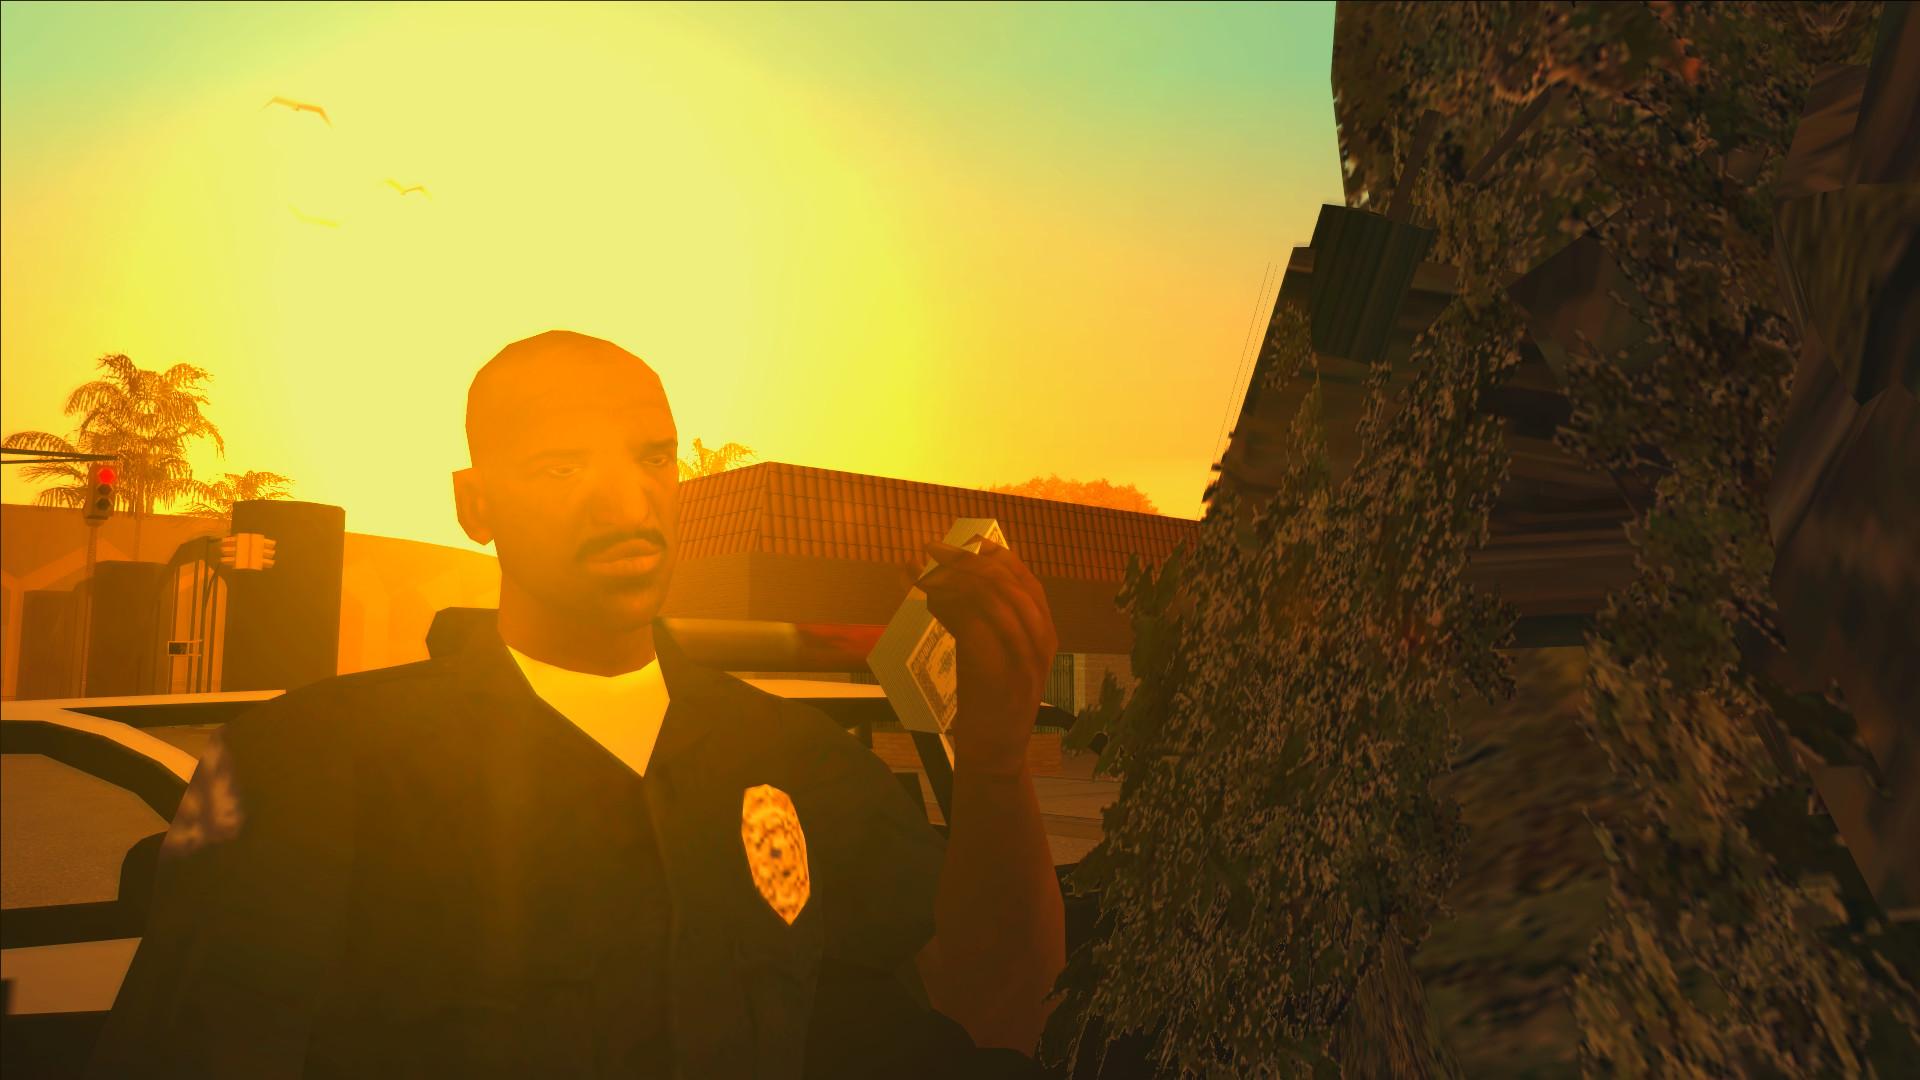 PS2 (YCbCr, Bigger Sun)